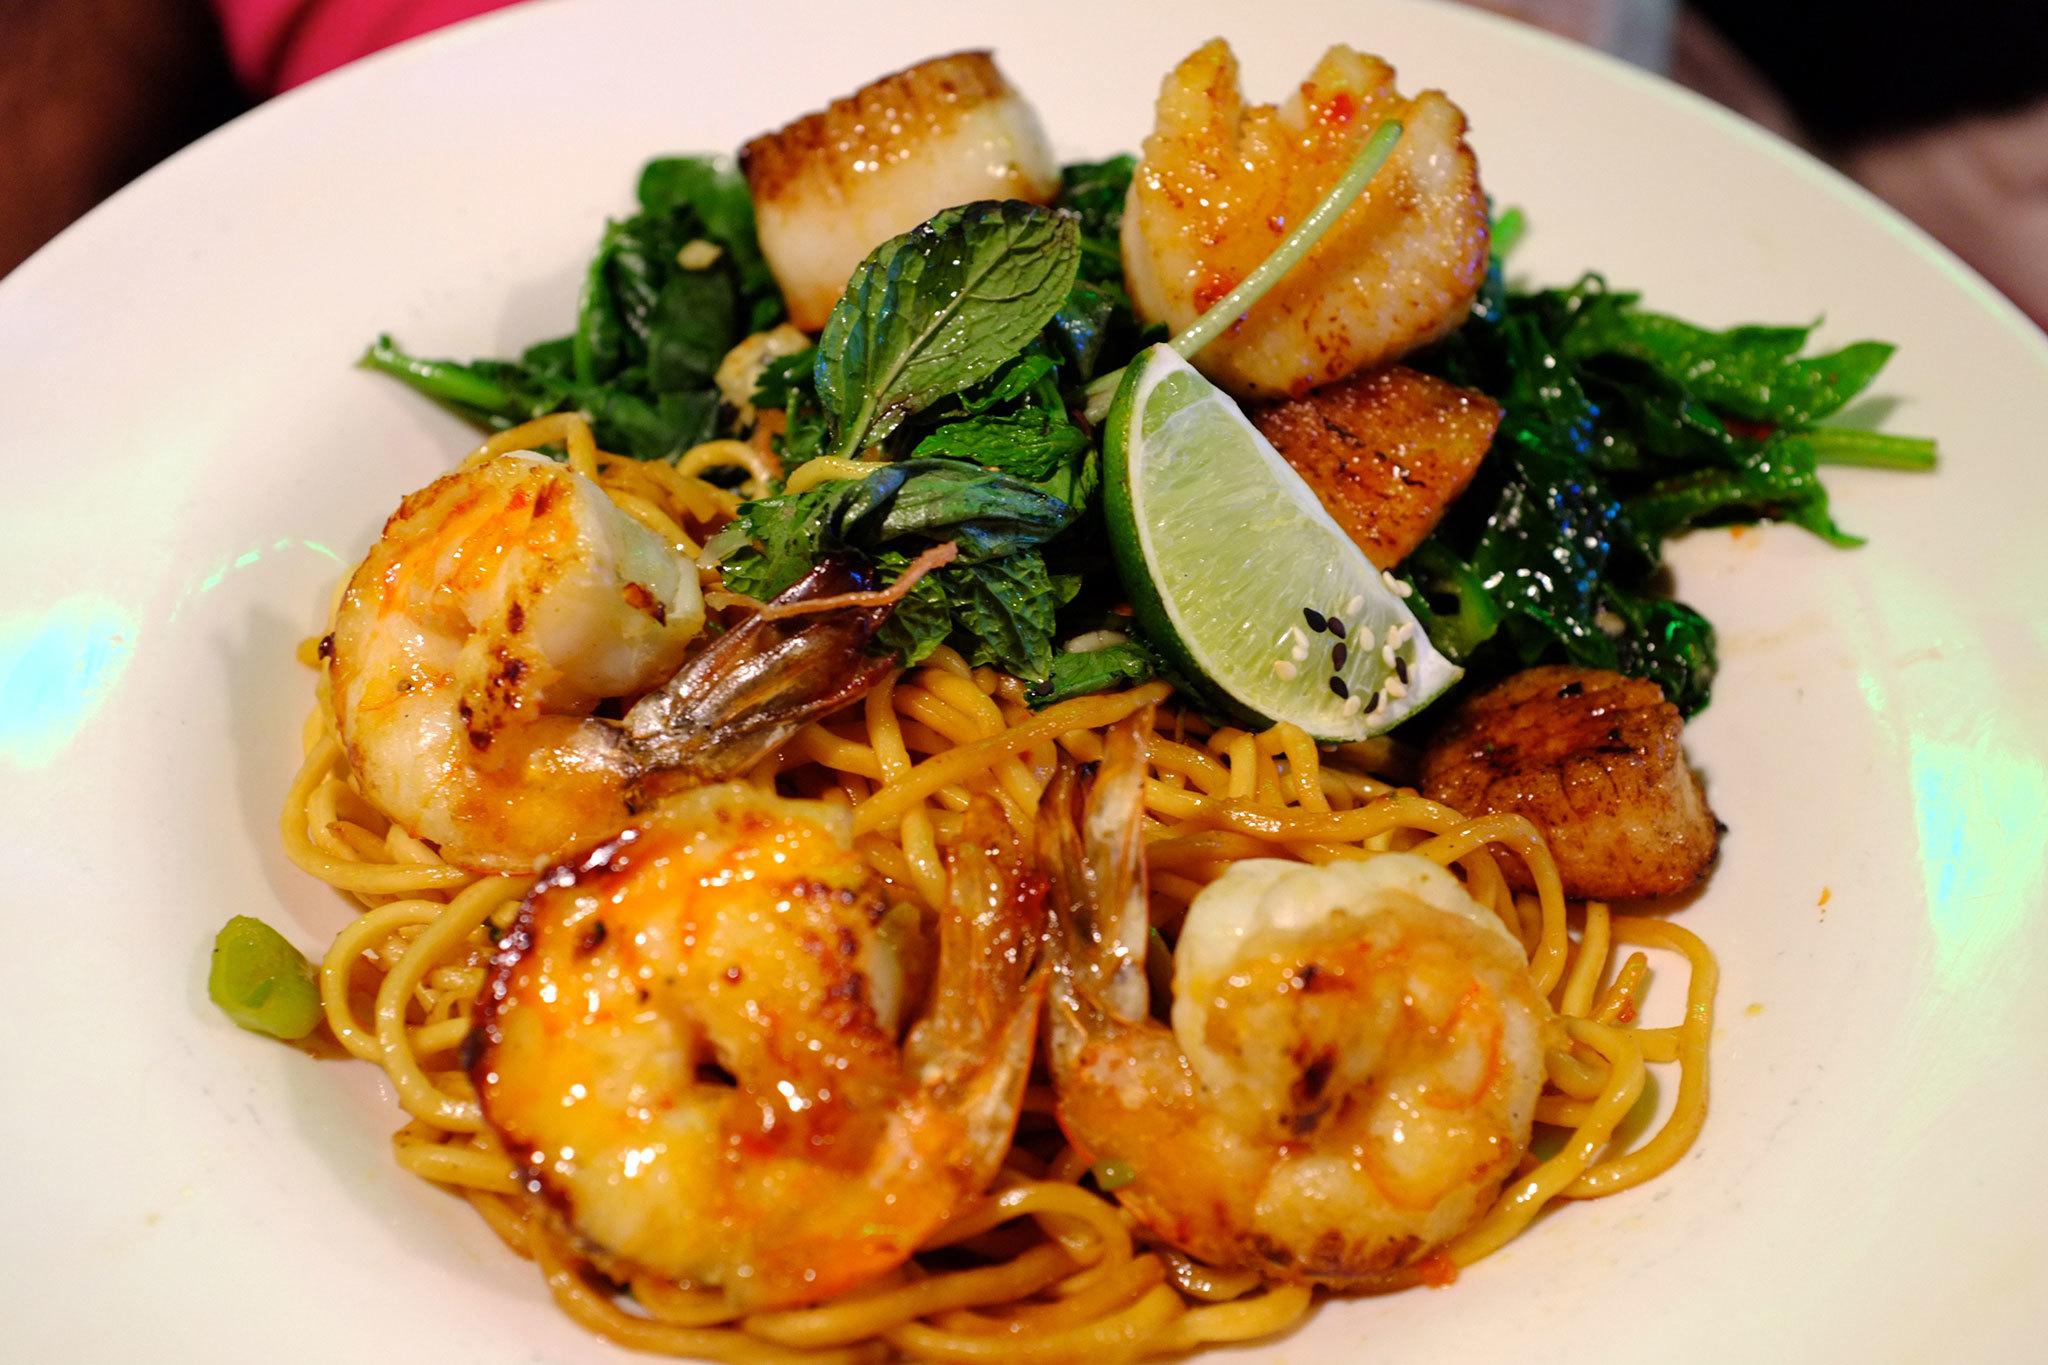 Best Boston restaurants: Diners, Italian restaurants and more